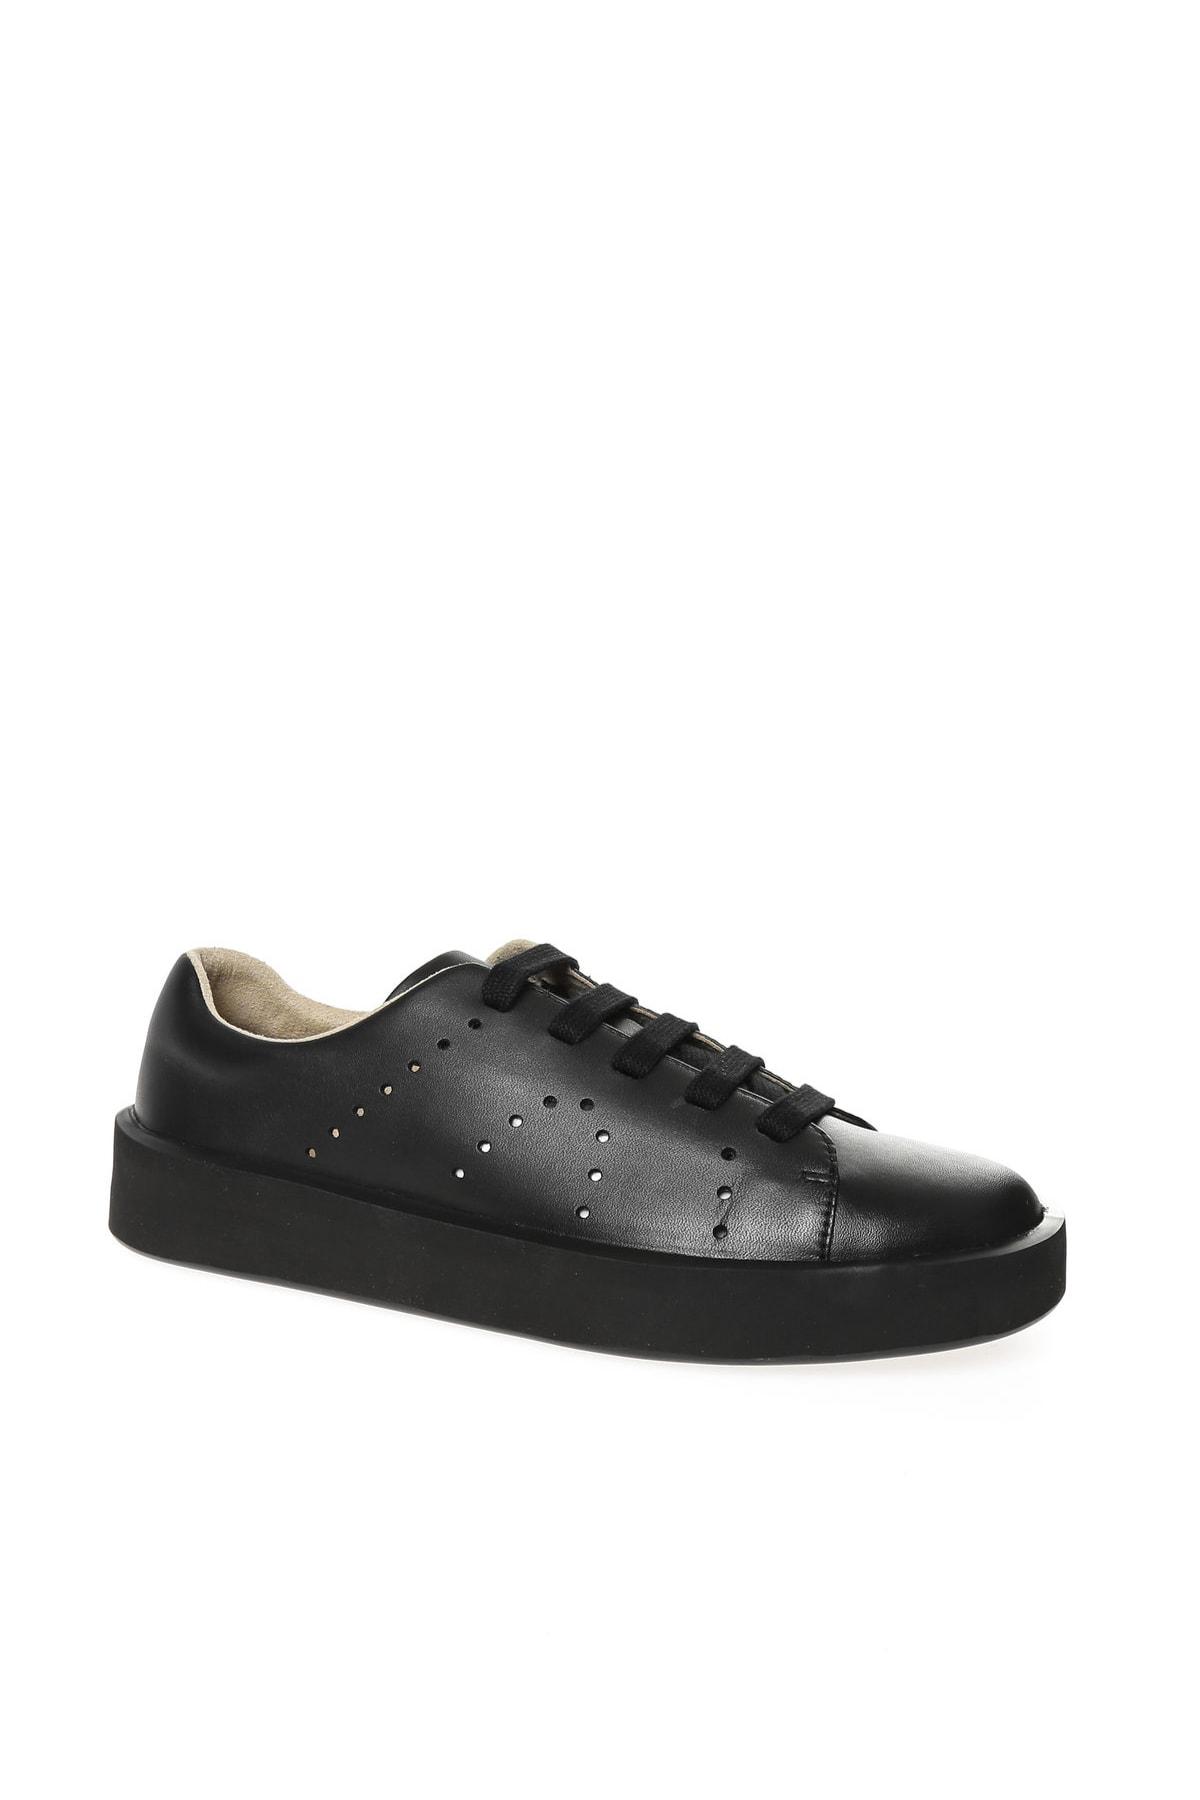 CAMPER Kadın Courb Sneaker K200828-023 2